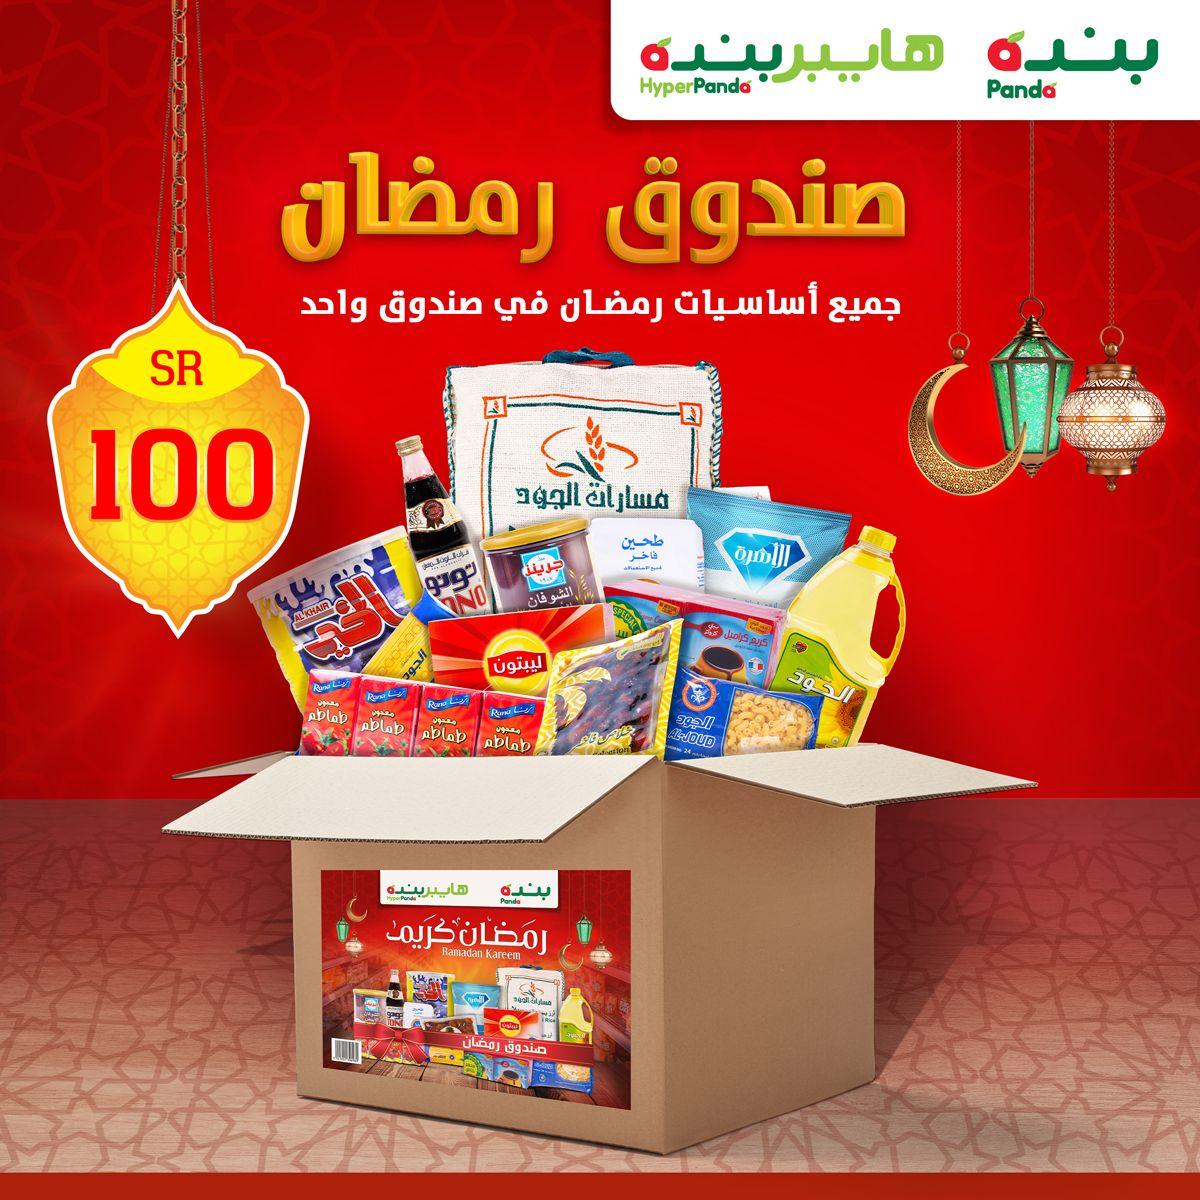 عروض رمضان عروض بنده علي صندوق رمضان الاربعاء 15 4 2020 بـ 100 ريال فقط Cereal Pops Pops Cereal Box Box